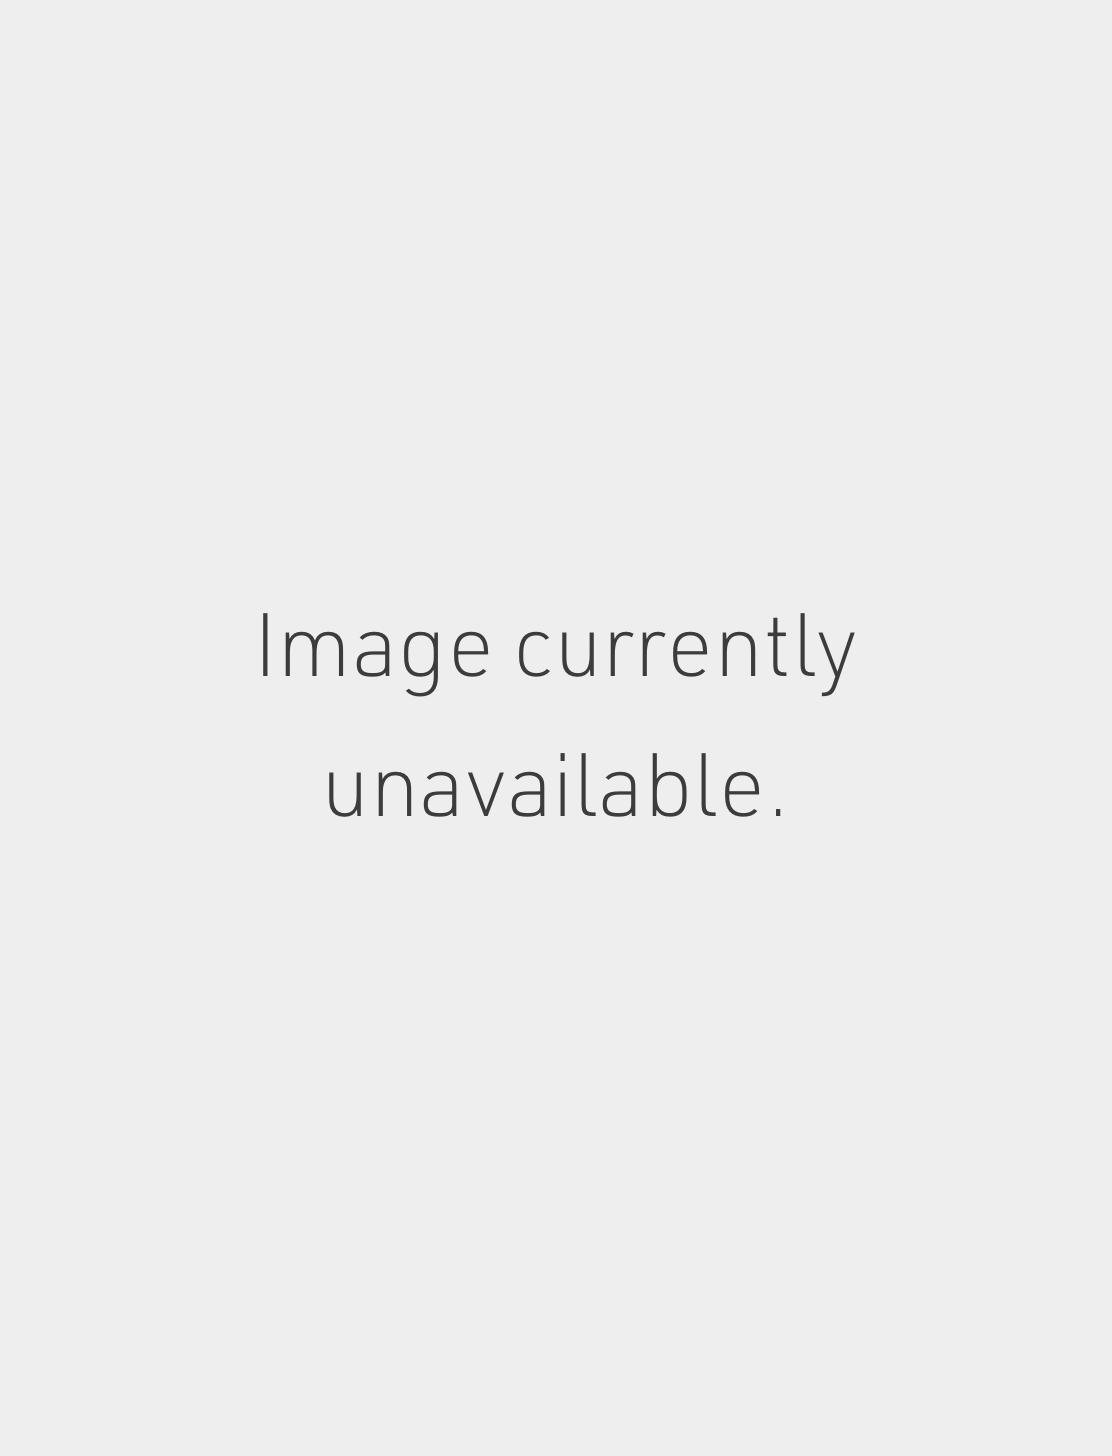 Sapphire/Dia Sword Long Image #1